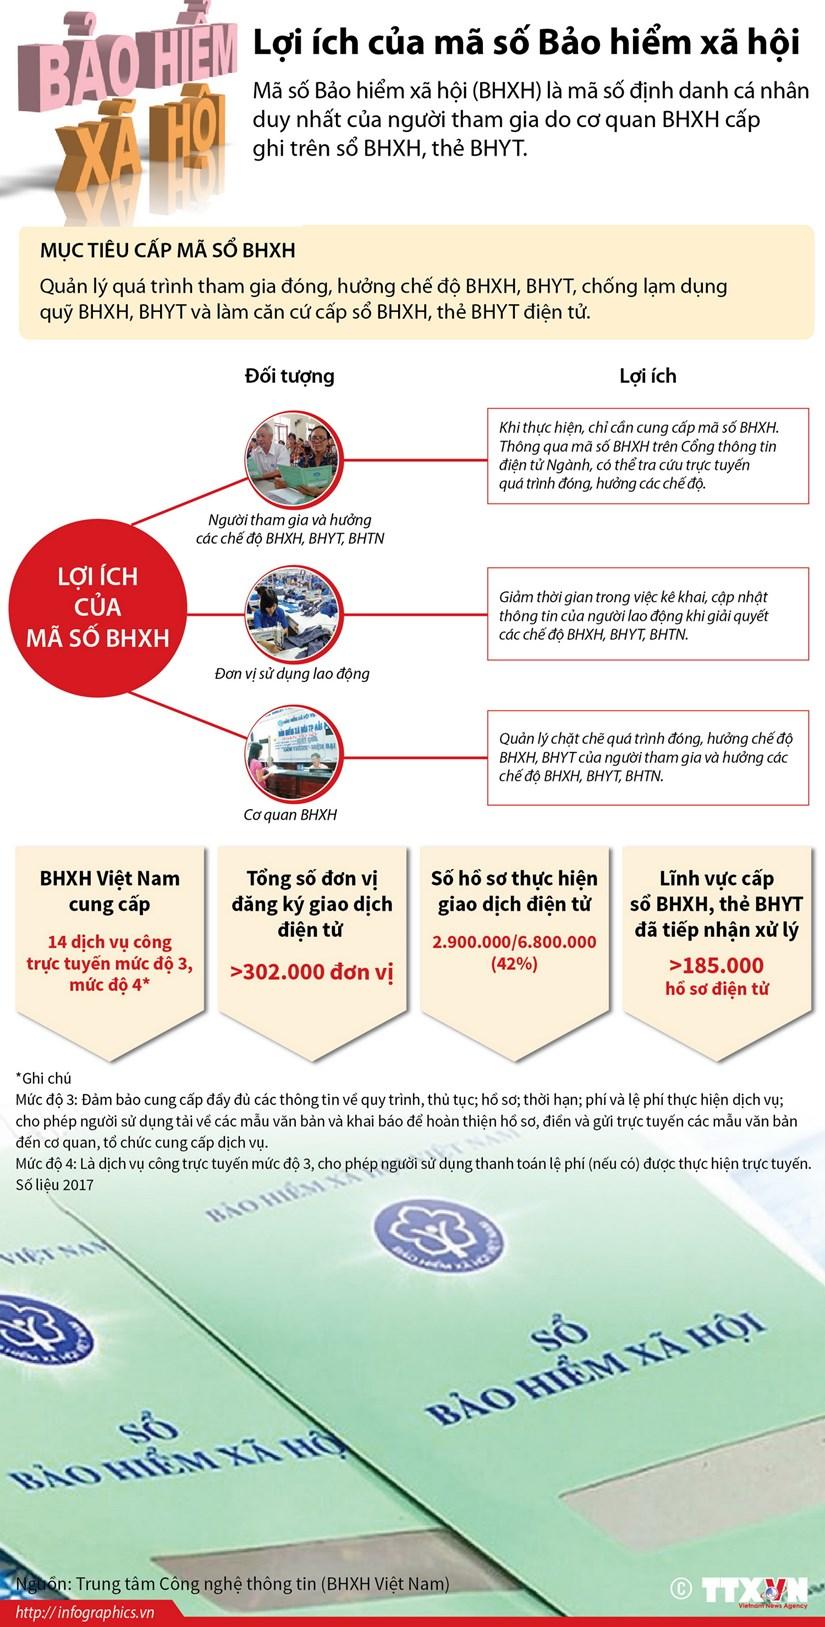 [Infographics] Nhung loi ich cua ma so Bao hiem xa hoi hinh anh 1